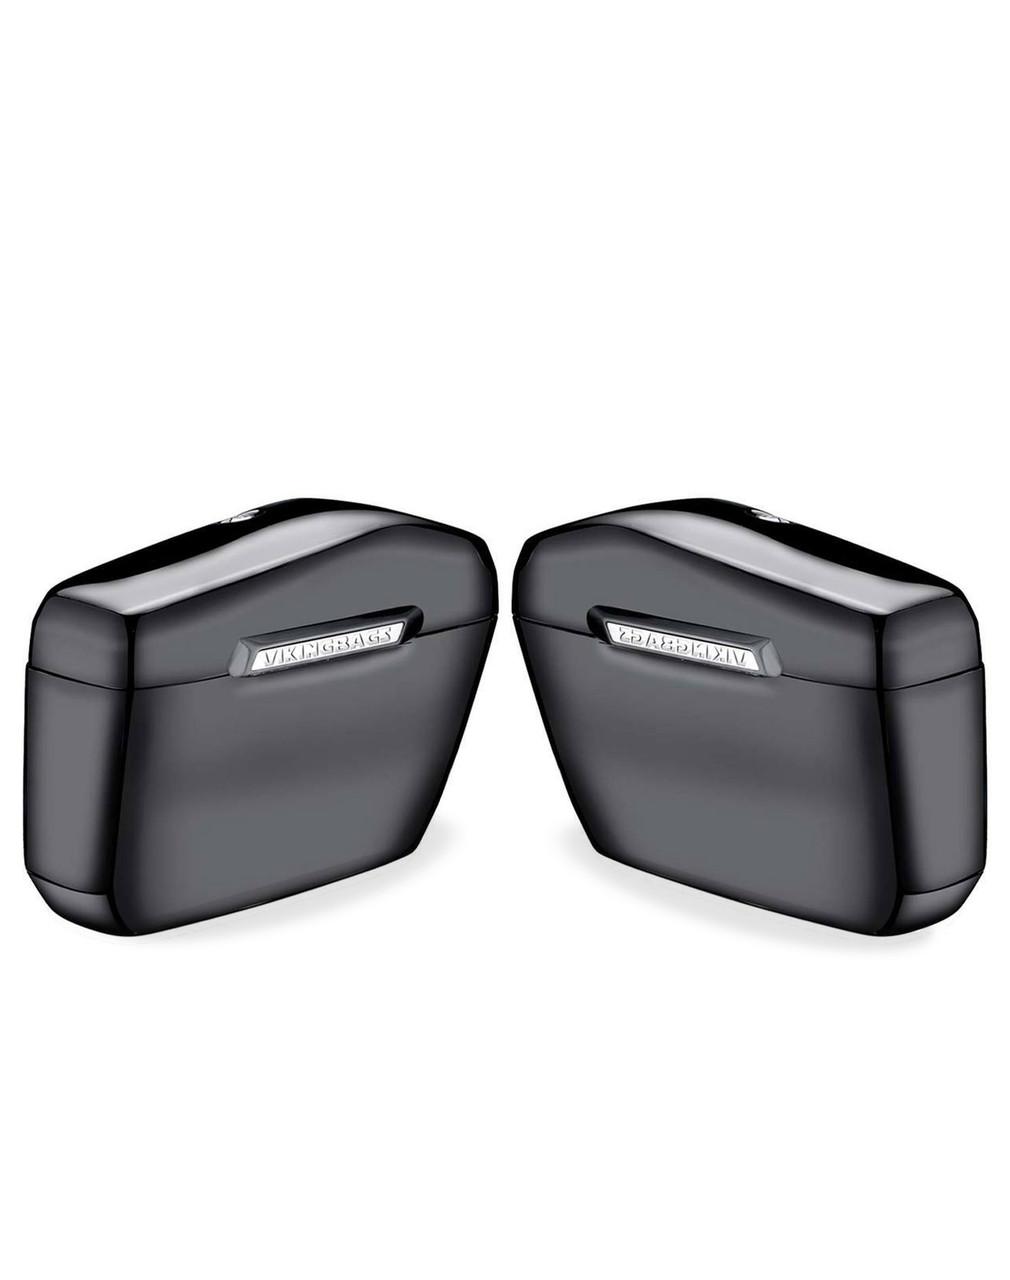 Honda VTX 1300 R Retro Viking Lamellar Large Black Hard Saddlebags Both Bags View